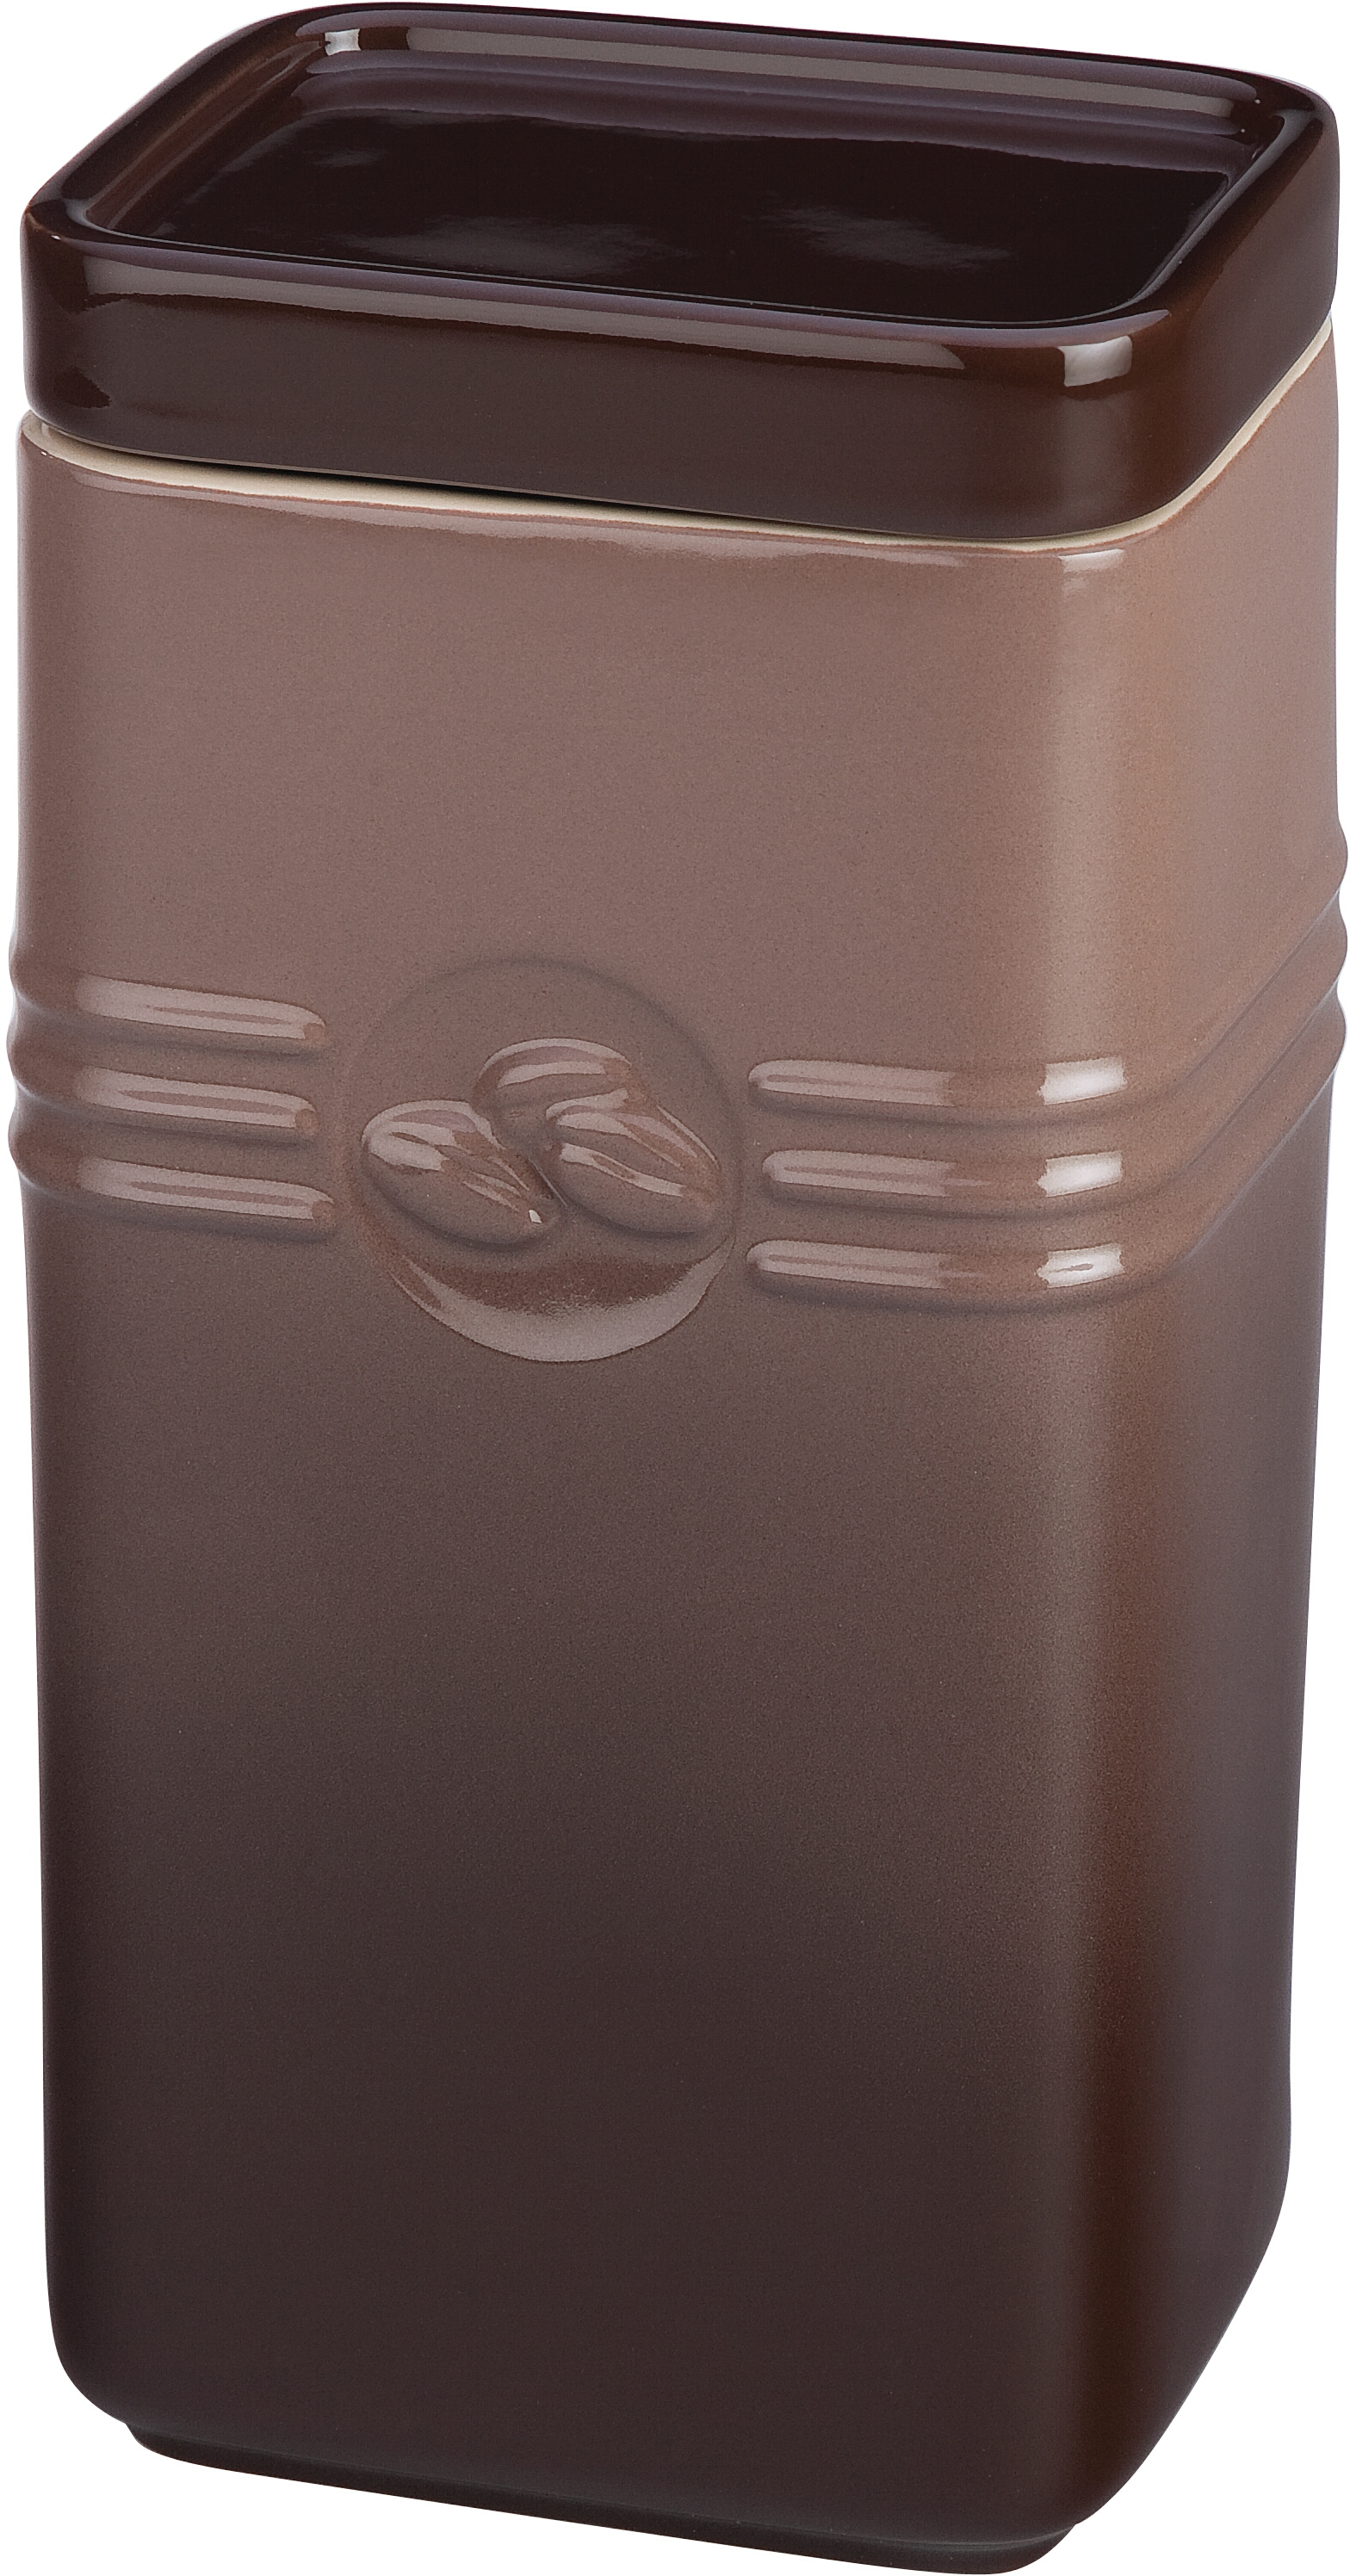 Le Creuset Truffle Stoneware 2 Quart Coffee Storage Jar